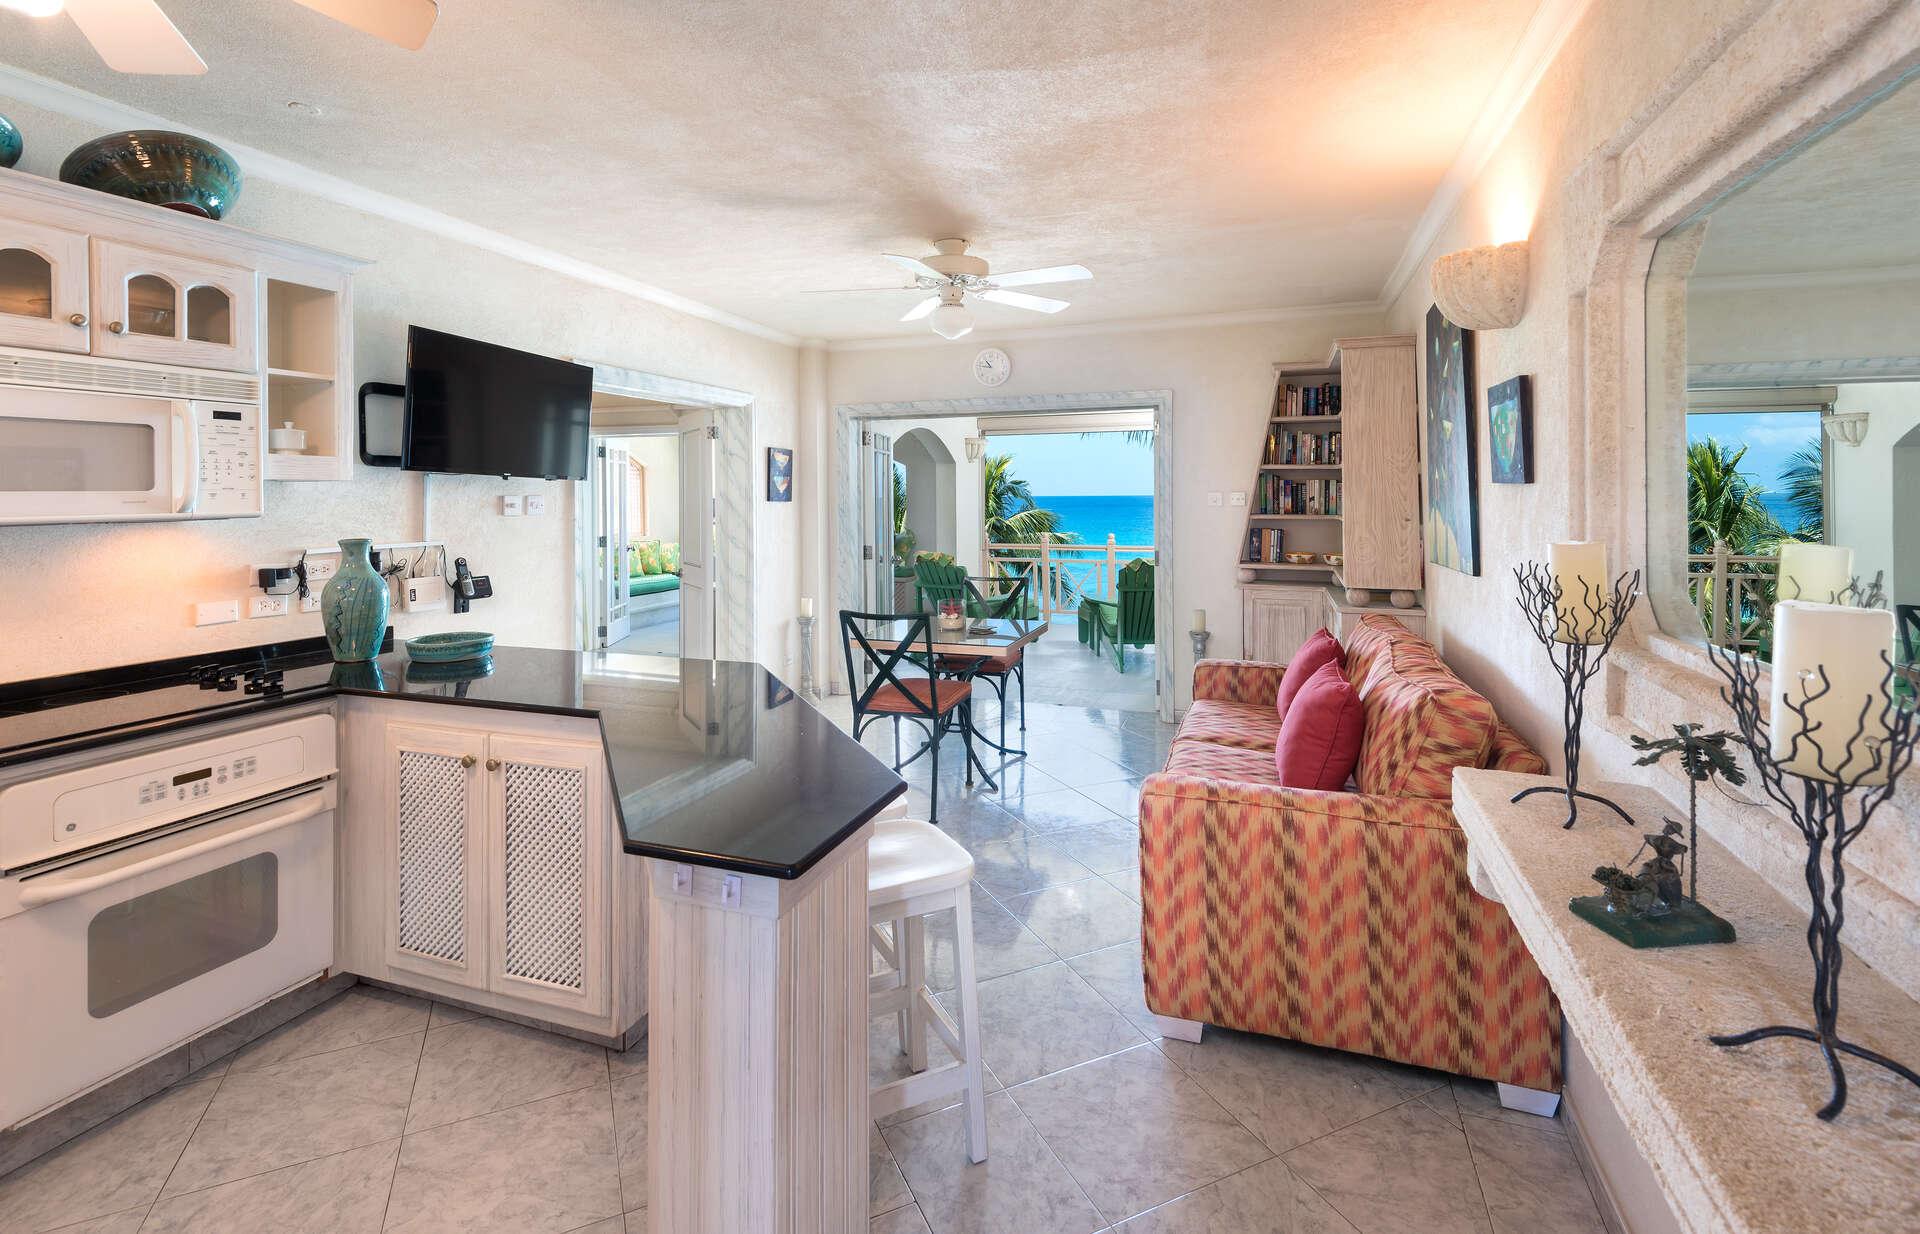 Luxury villa rentals caribbean - Barbados - St james - Reeds bay - Reeds House Penthouse - Image 1/8